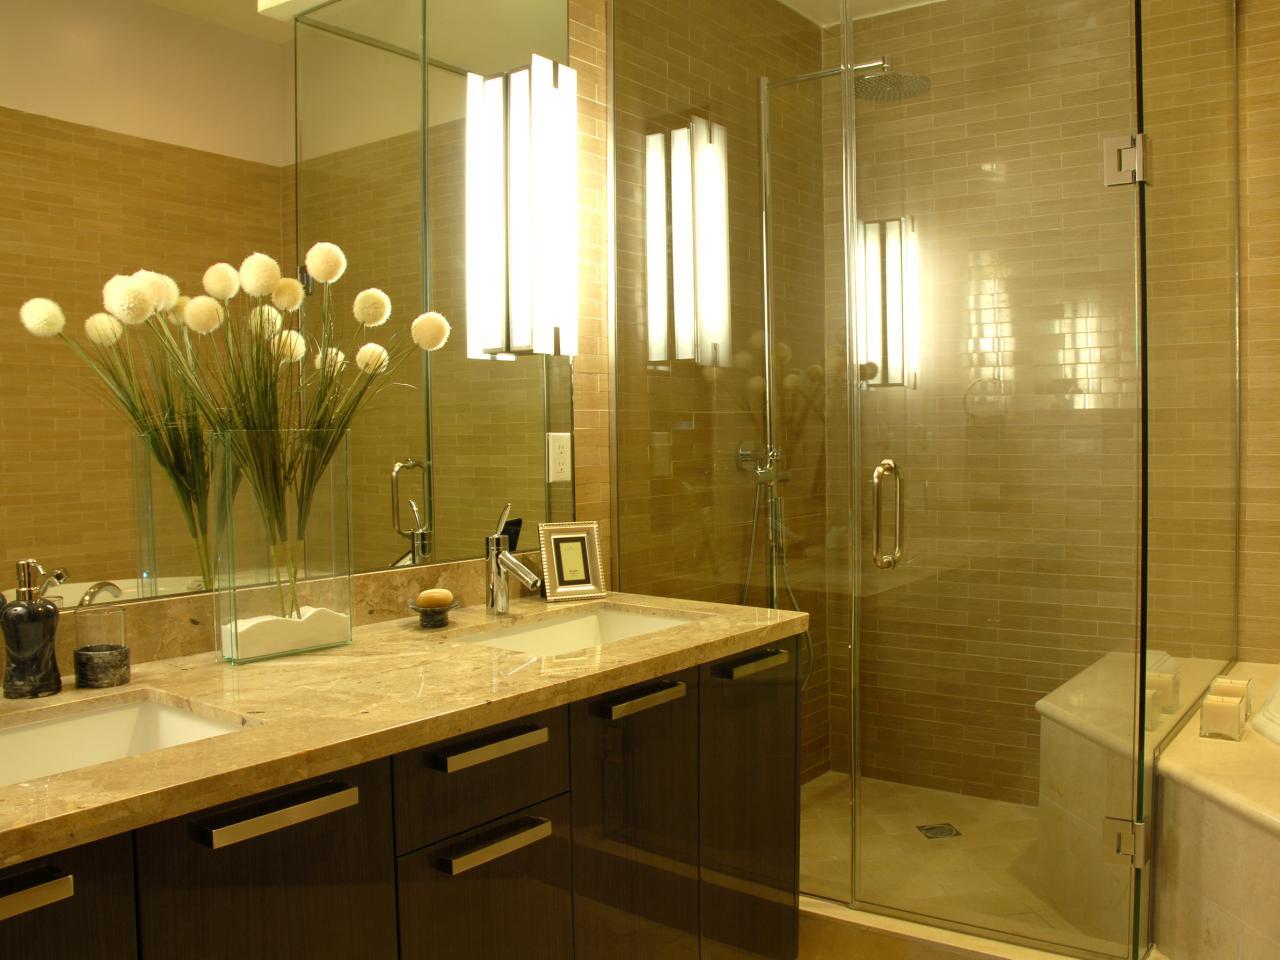 Kim-Ammie-Gold-Bathroom_02_s4x3.jpg.rend.hgtvcom.1280.960